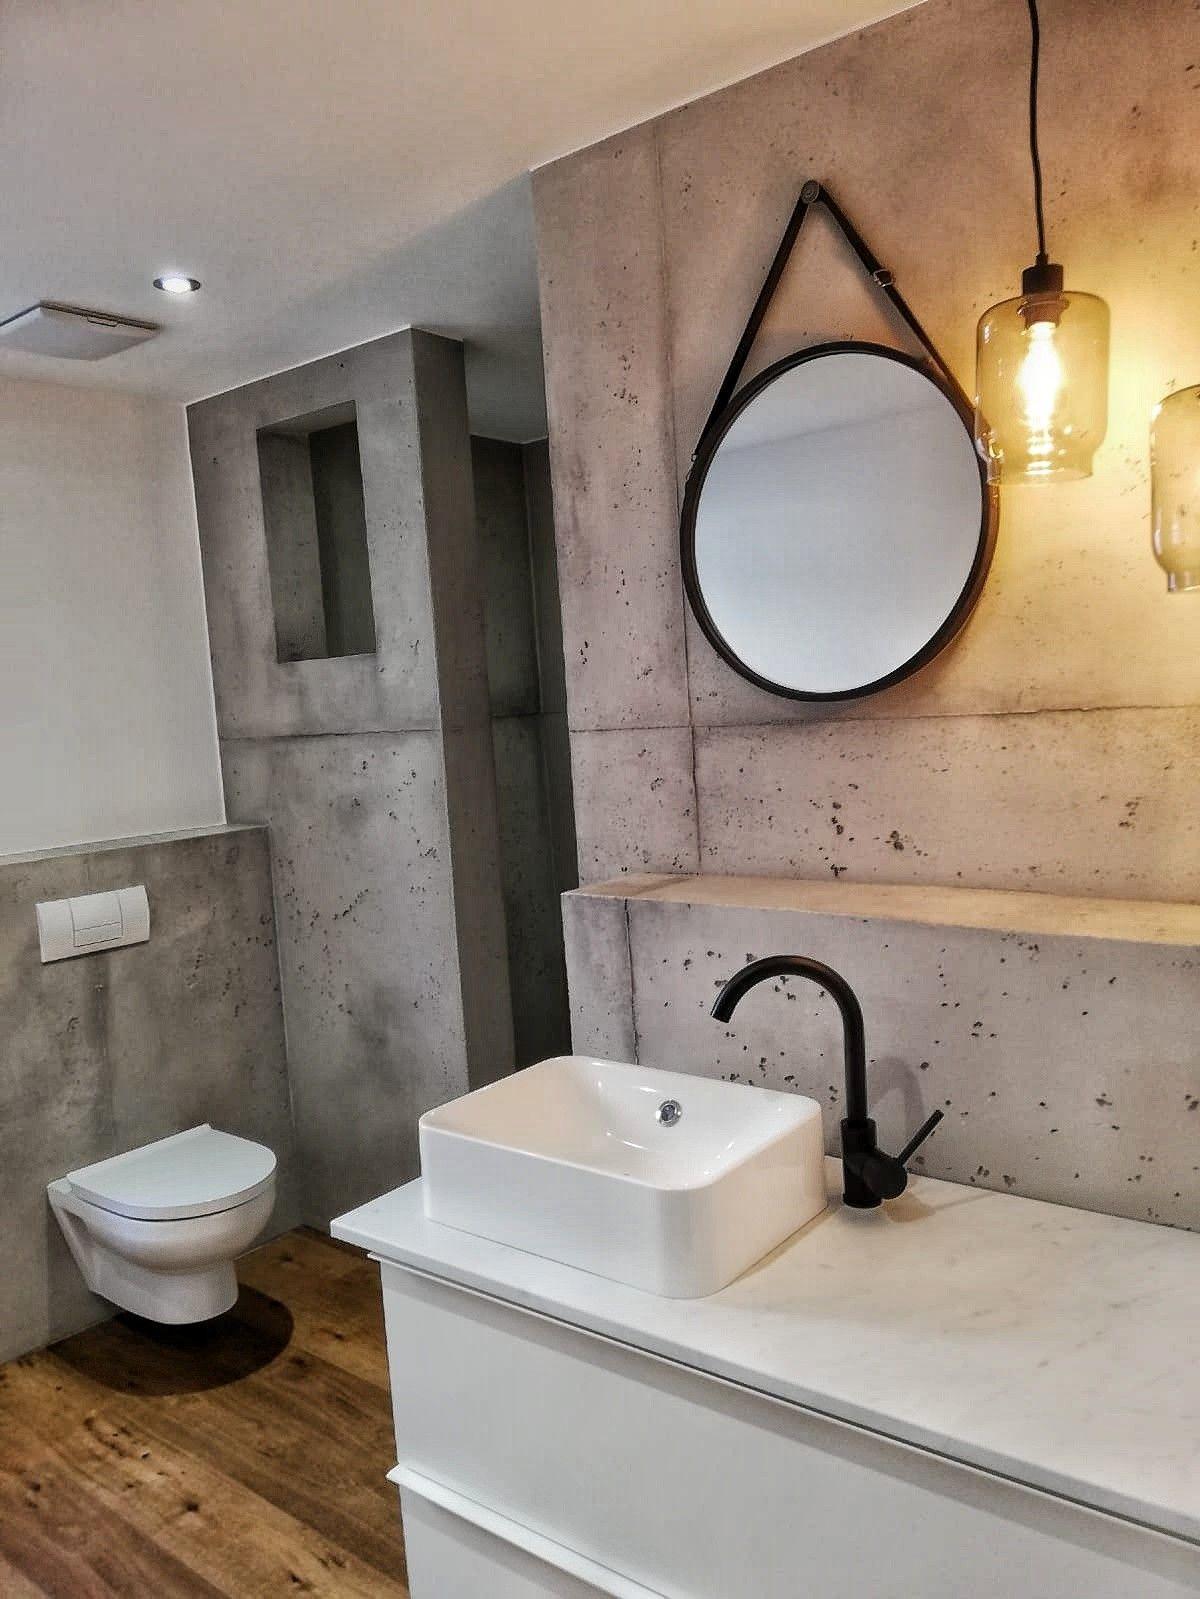 Betonoptik Im Badezimmer Wandgefuhl Frank Loken Bodengestaltung Wand Badezimmer